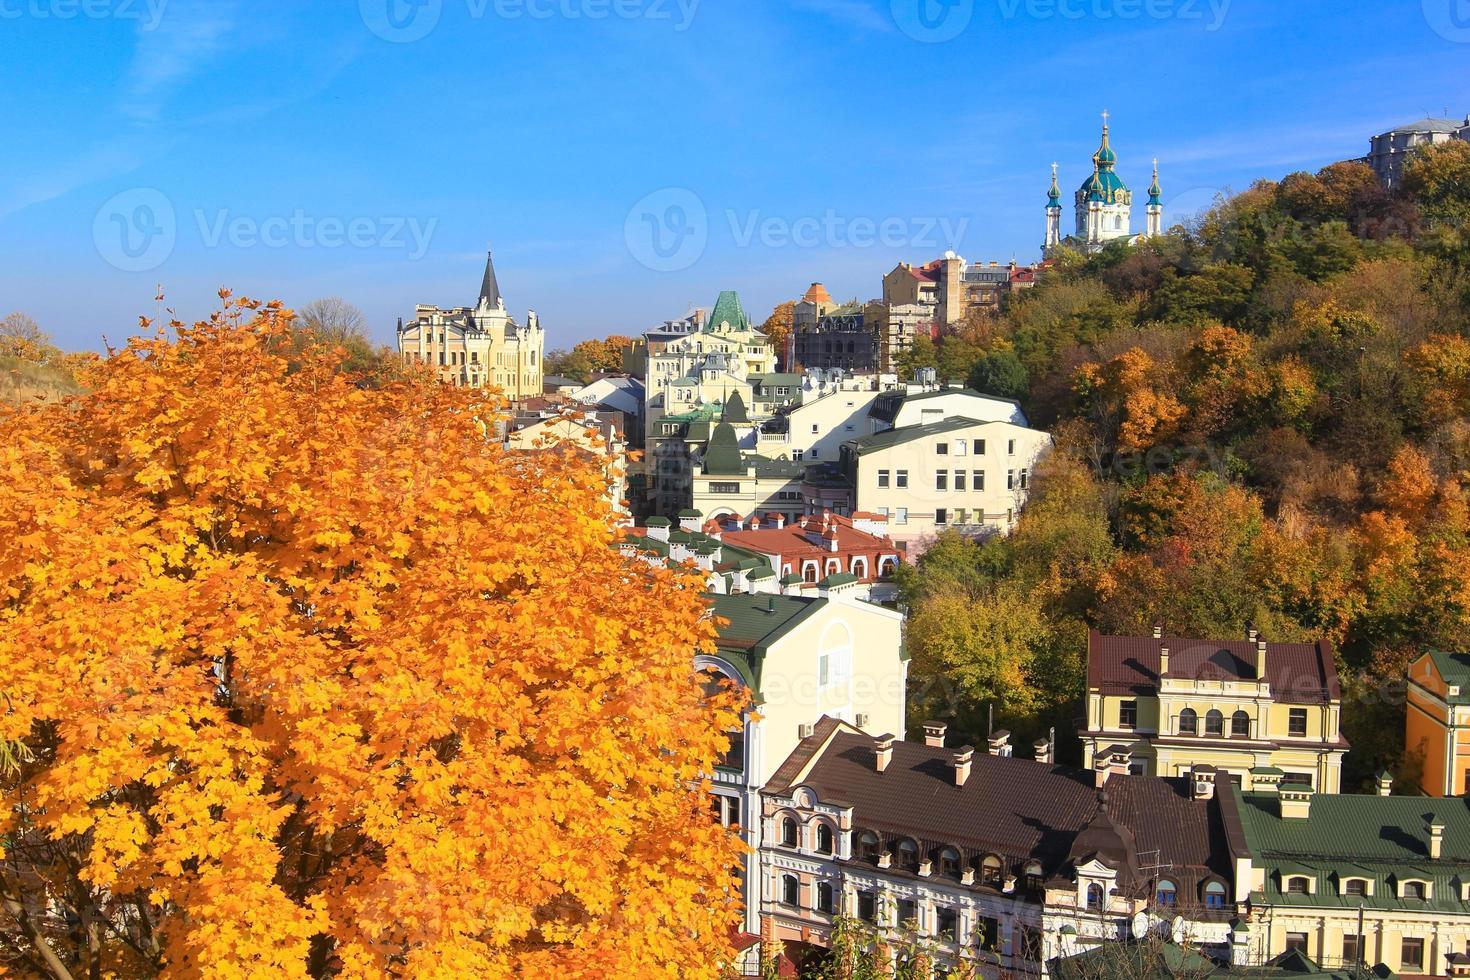 Herbst in Kiew, Ukraine foto